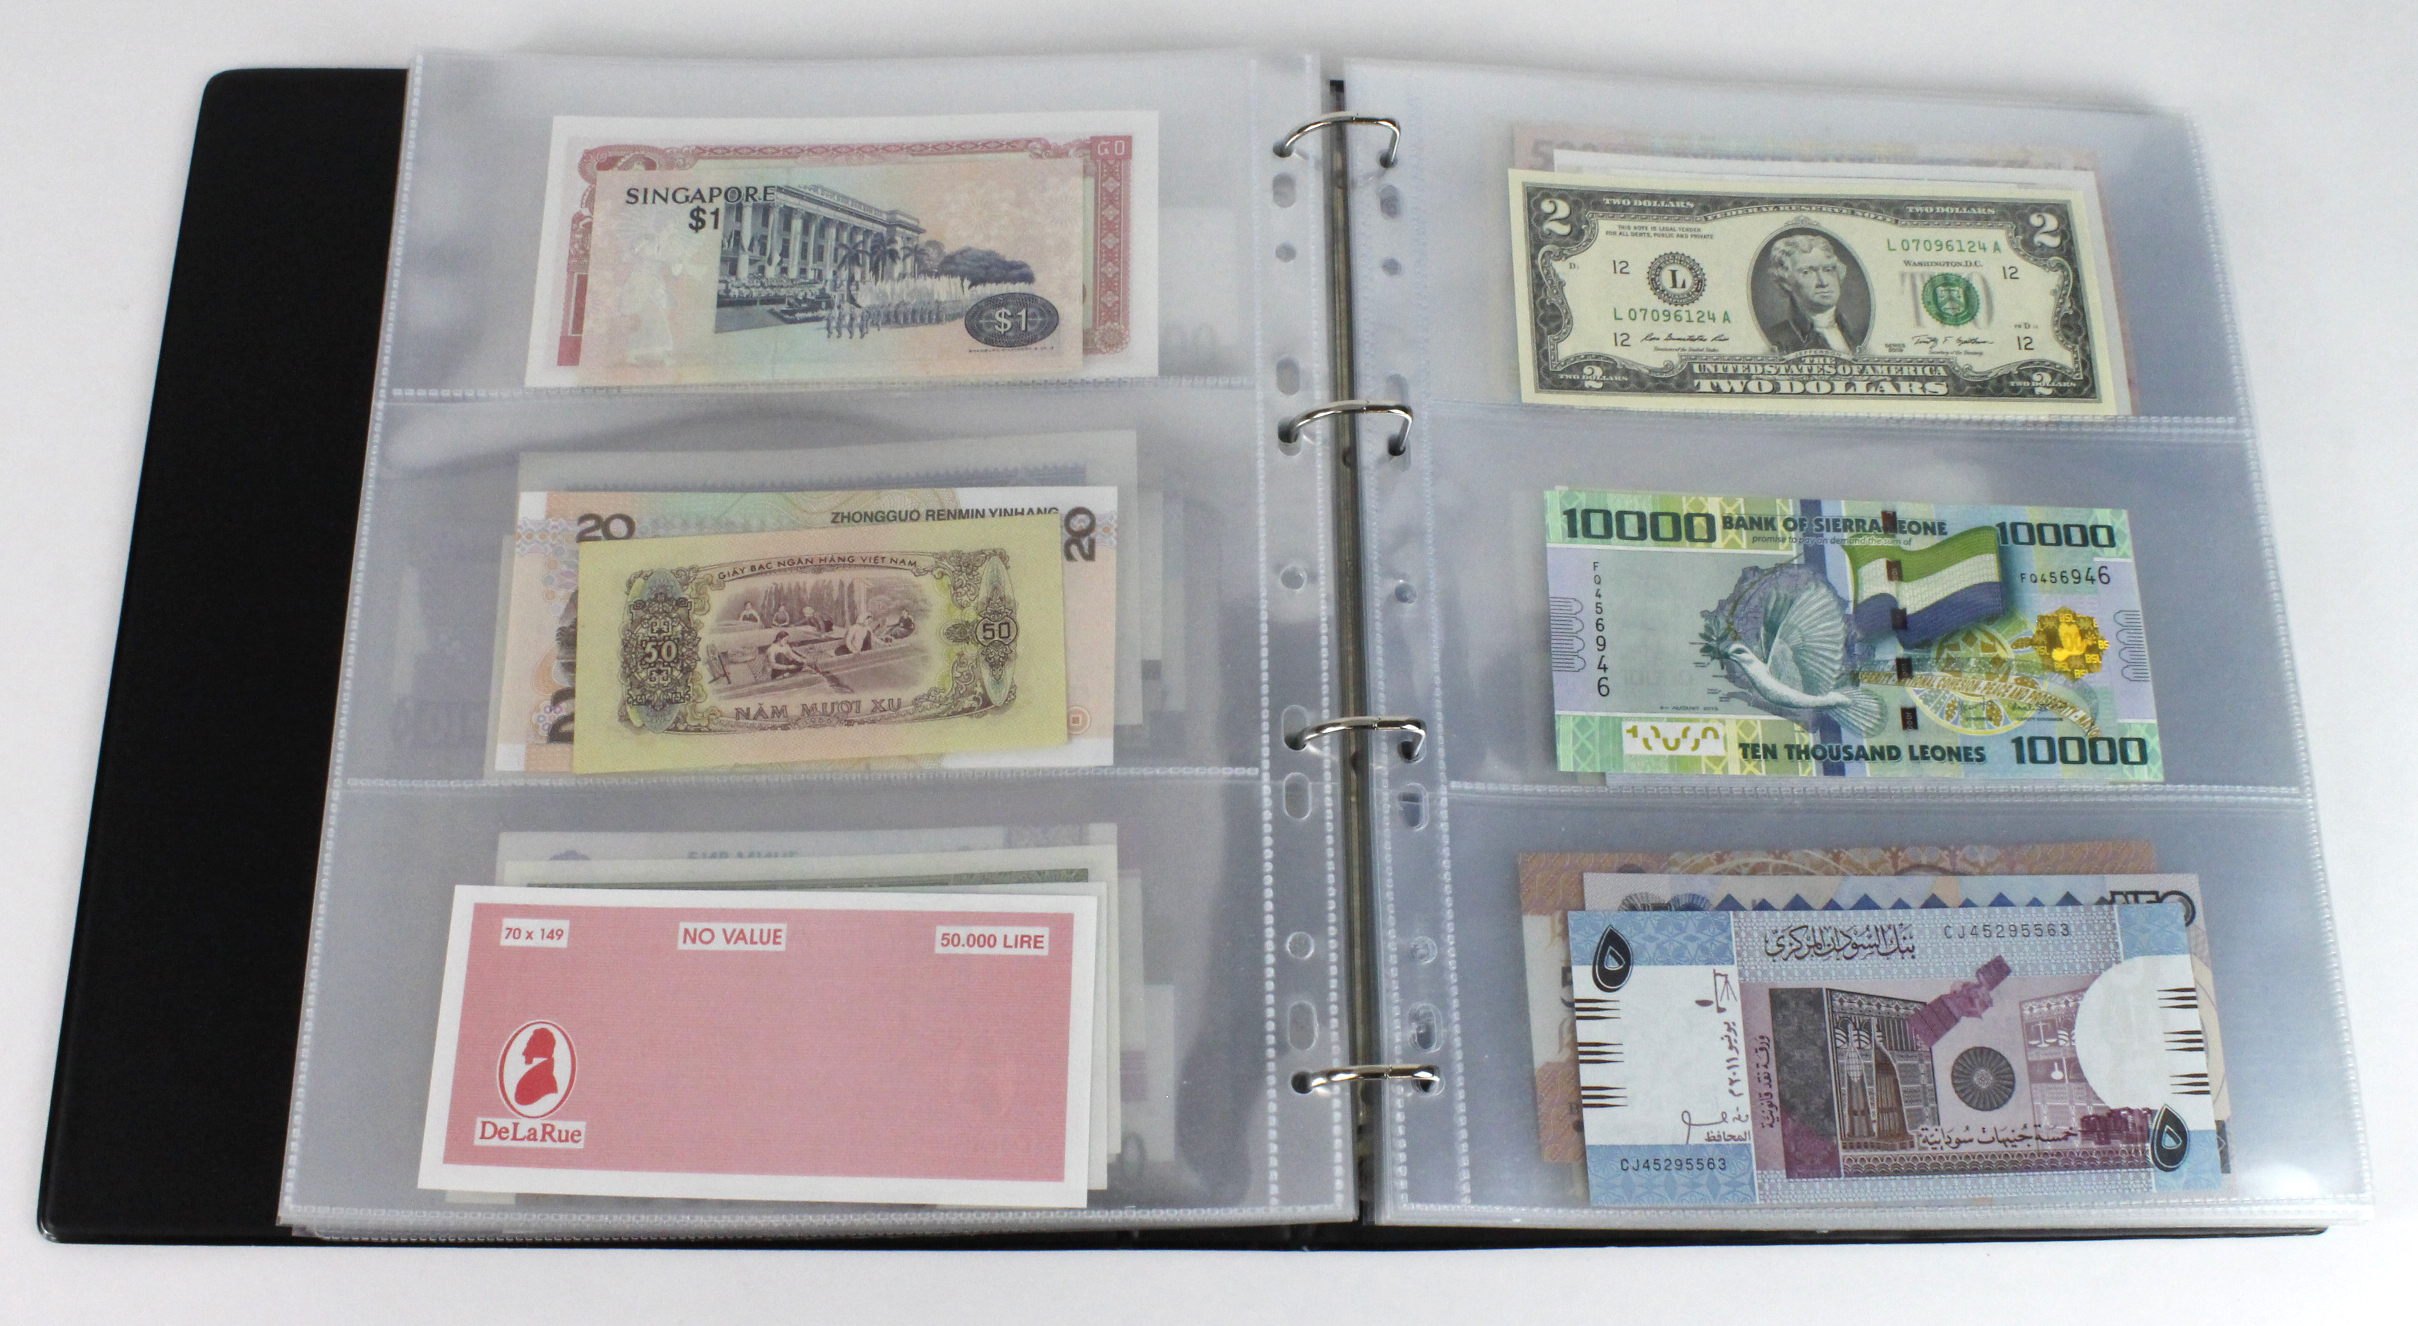 World (163), in banknote album including Bahamas, Spain, Sweden, Netherlands, Algeria, Macau, - Image 32 of 57